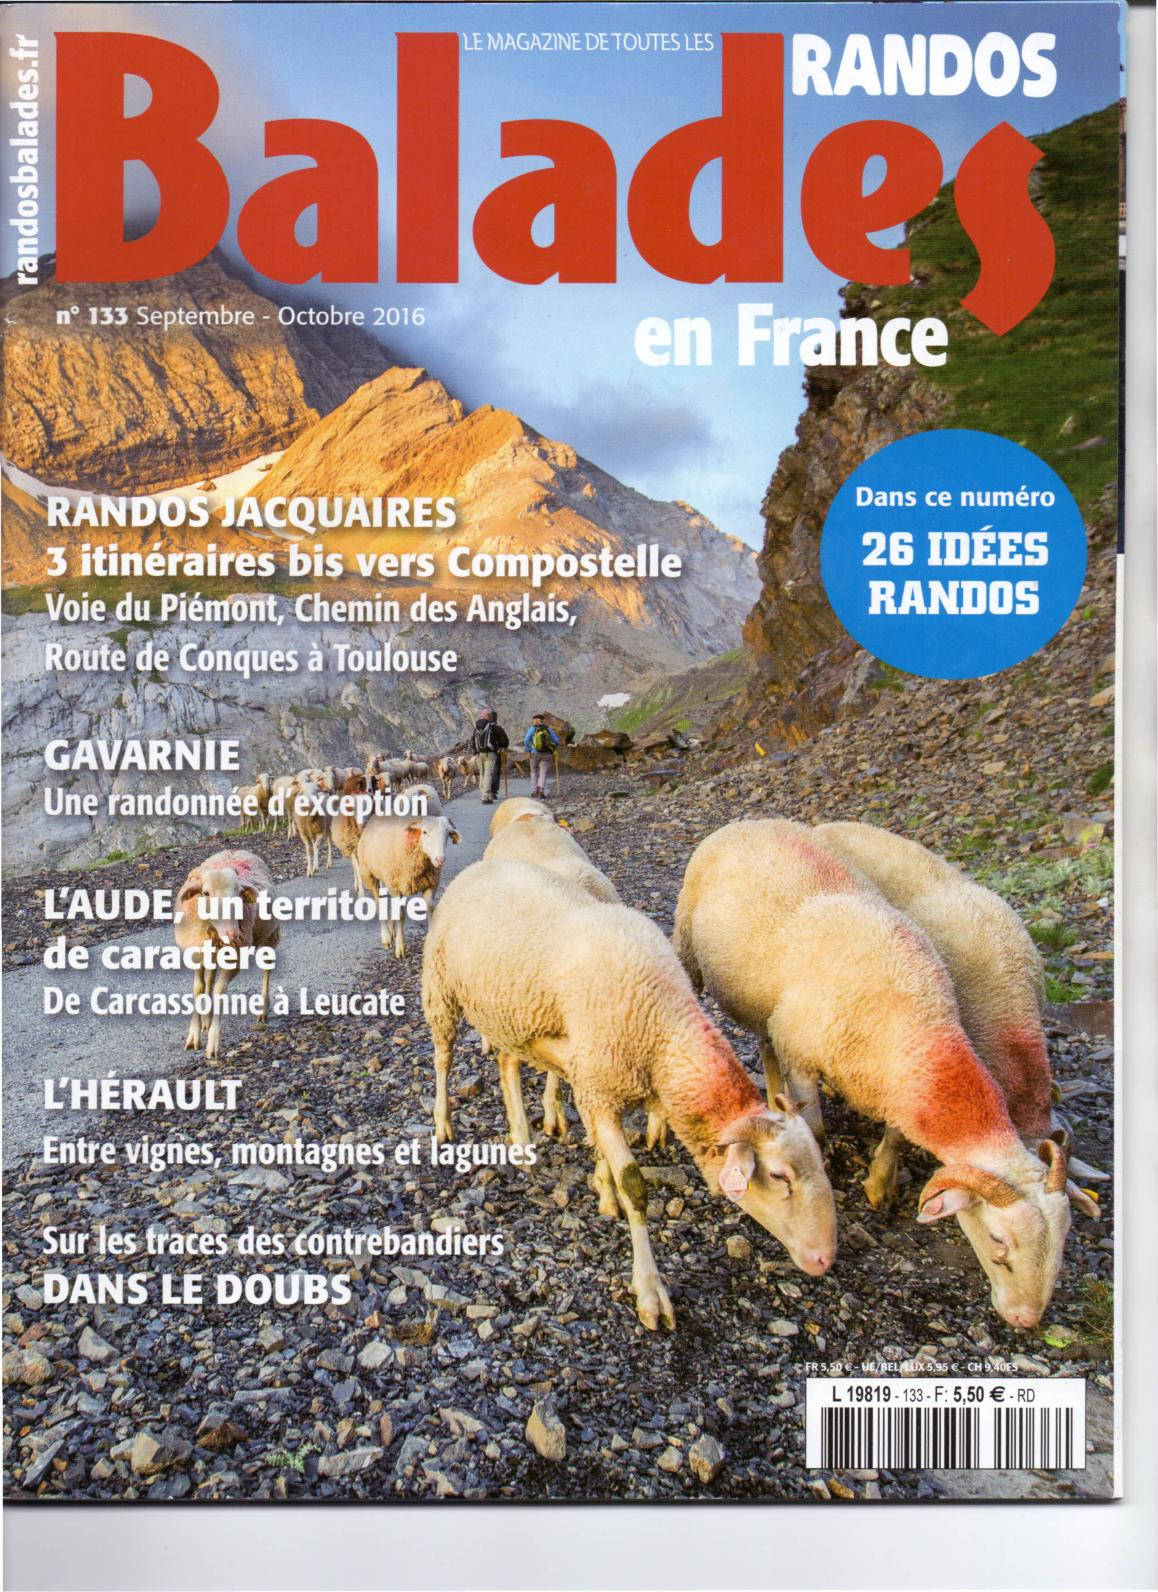 Calameo Magazine Balades Randos En France Sur Les Traces De Joe Bousquet A La Palme